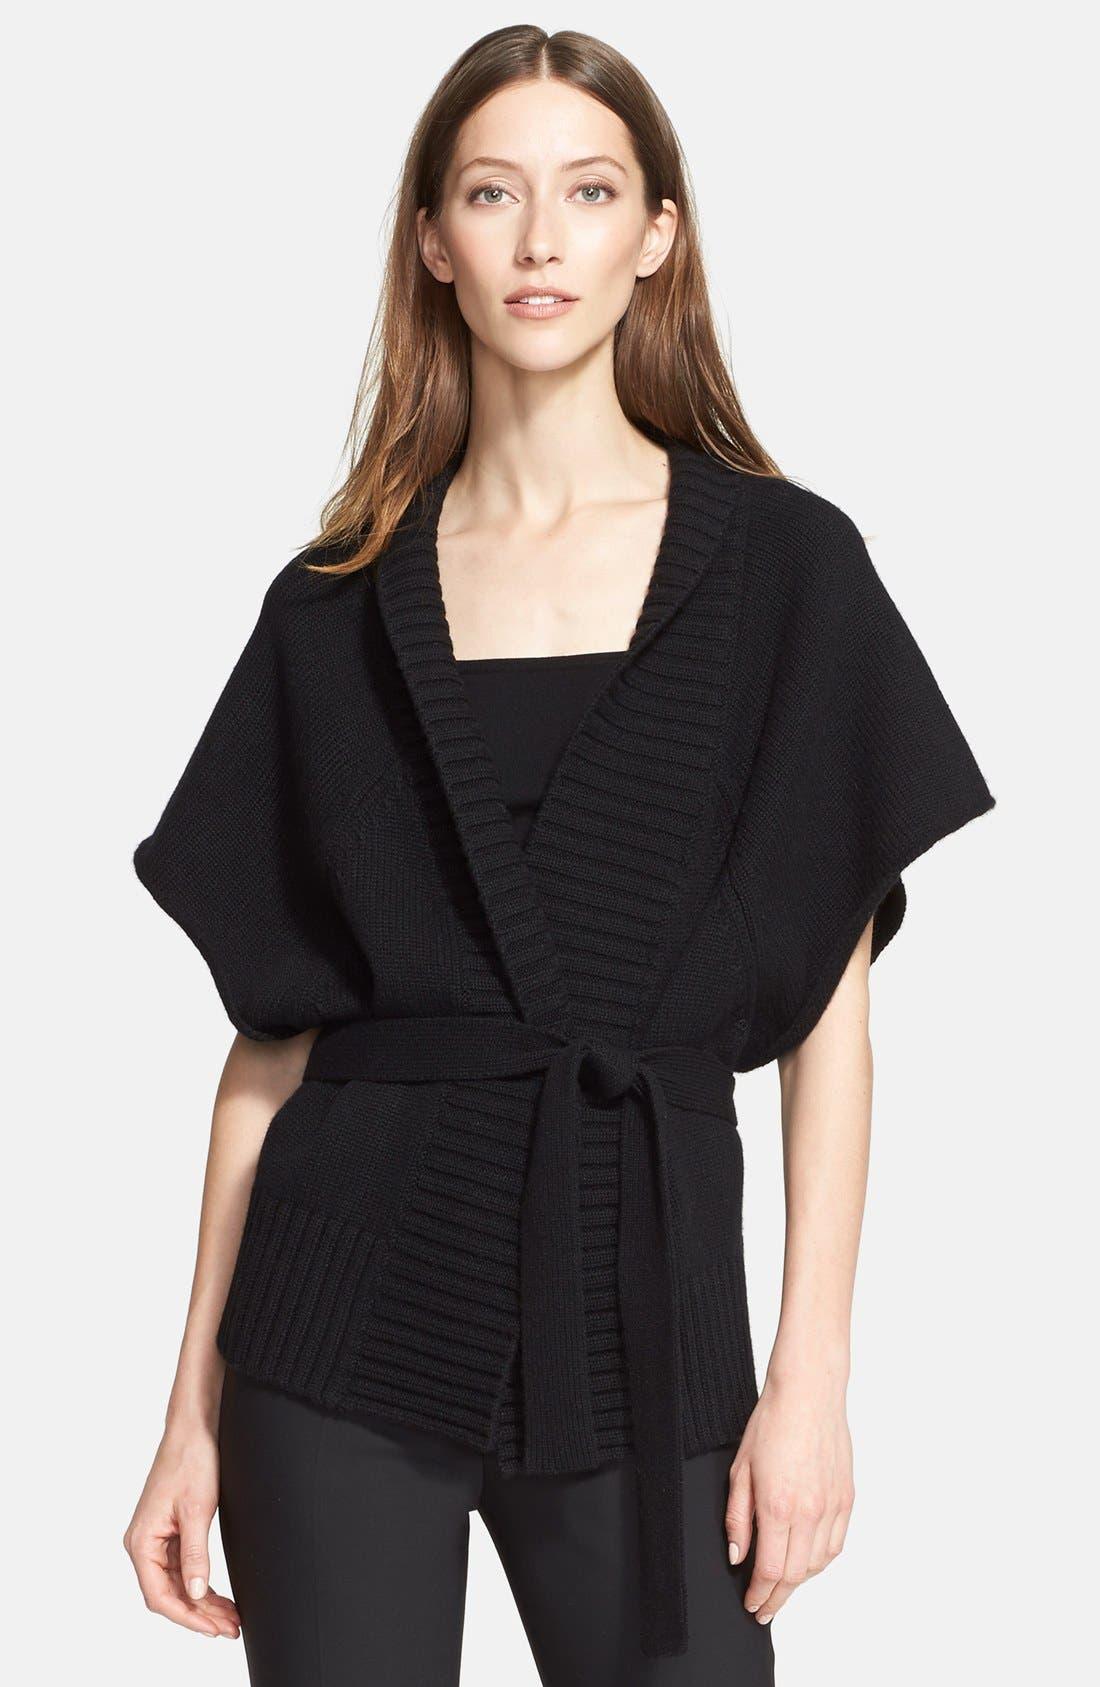 Michael Kors Rib Trim Cashmere Kimono Cardigan   Nordstrom